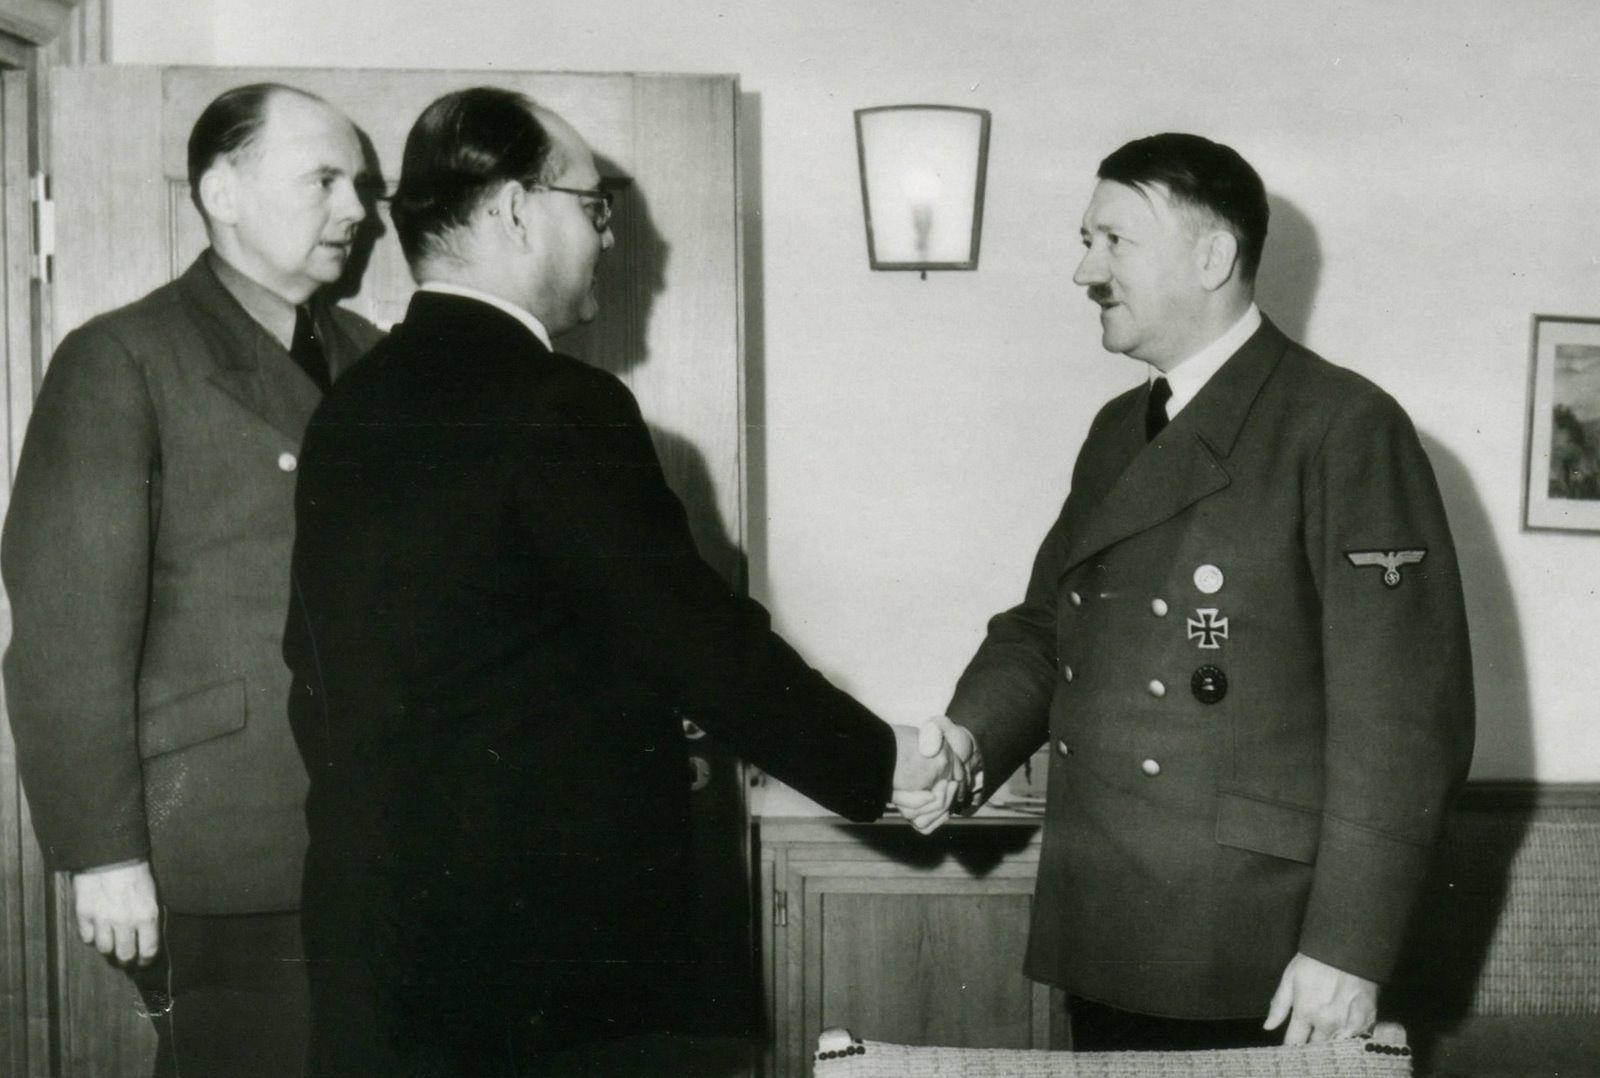 Netaji Subhas Chandra Bose and Adolf Hitler - Germany 29 May 1942